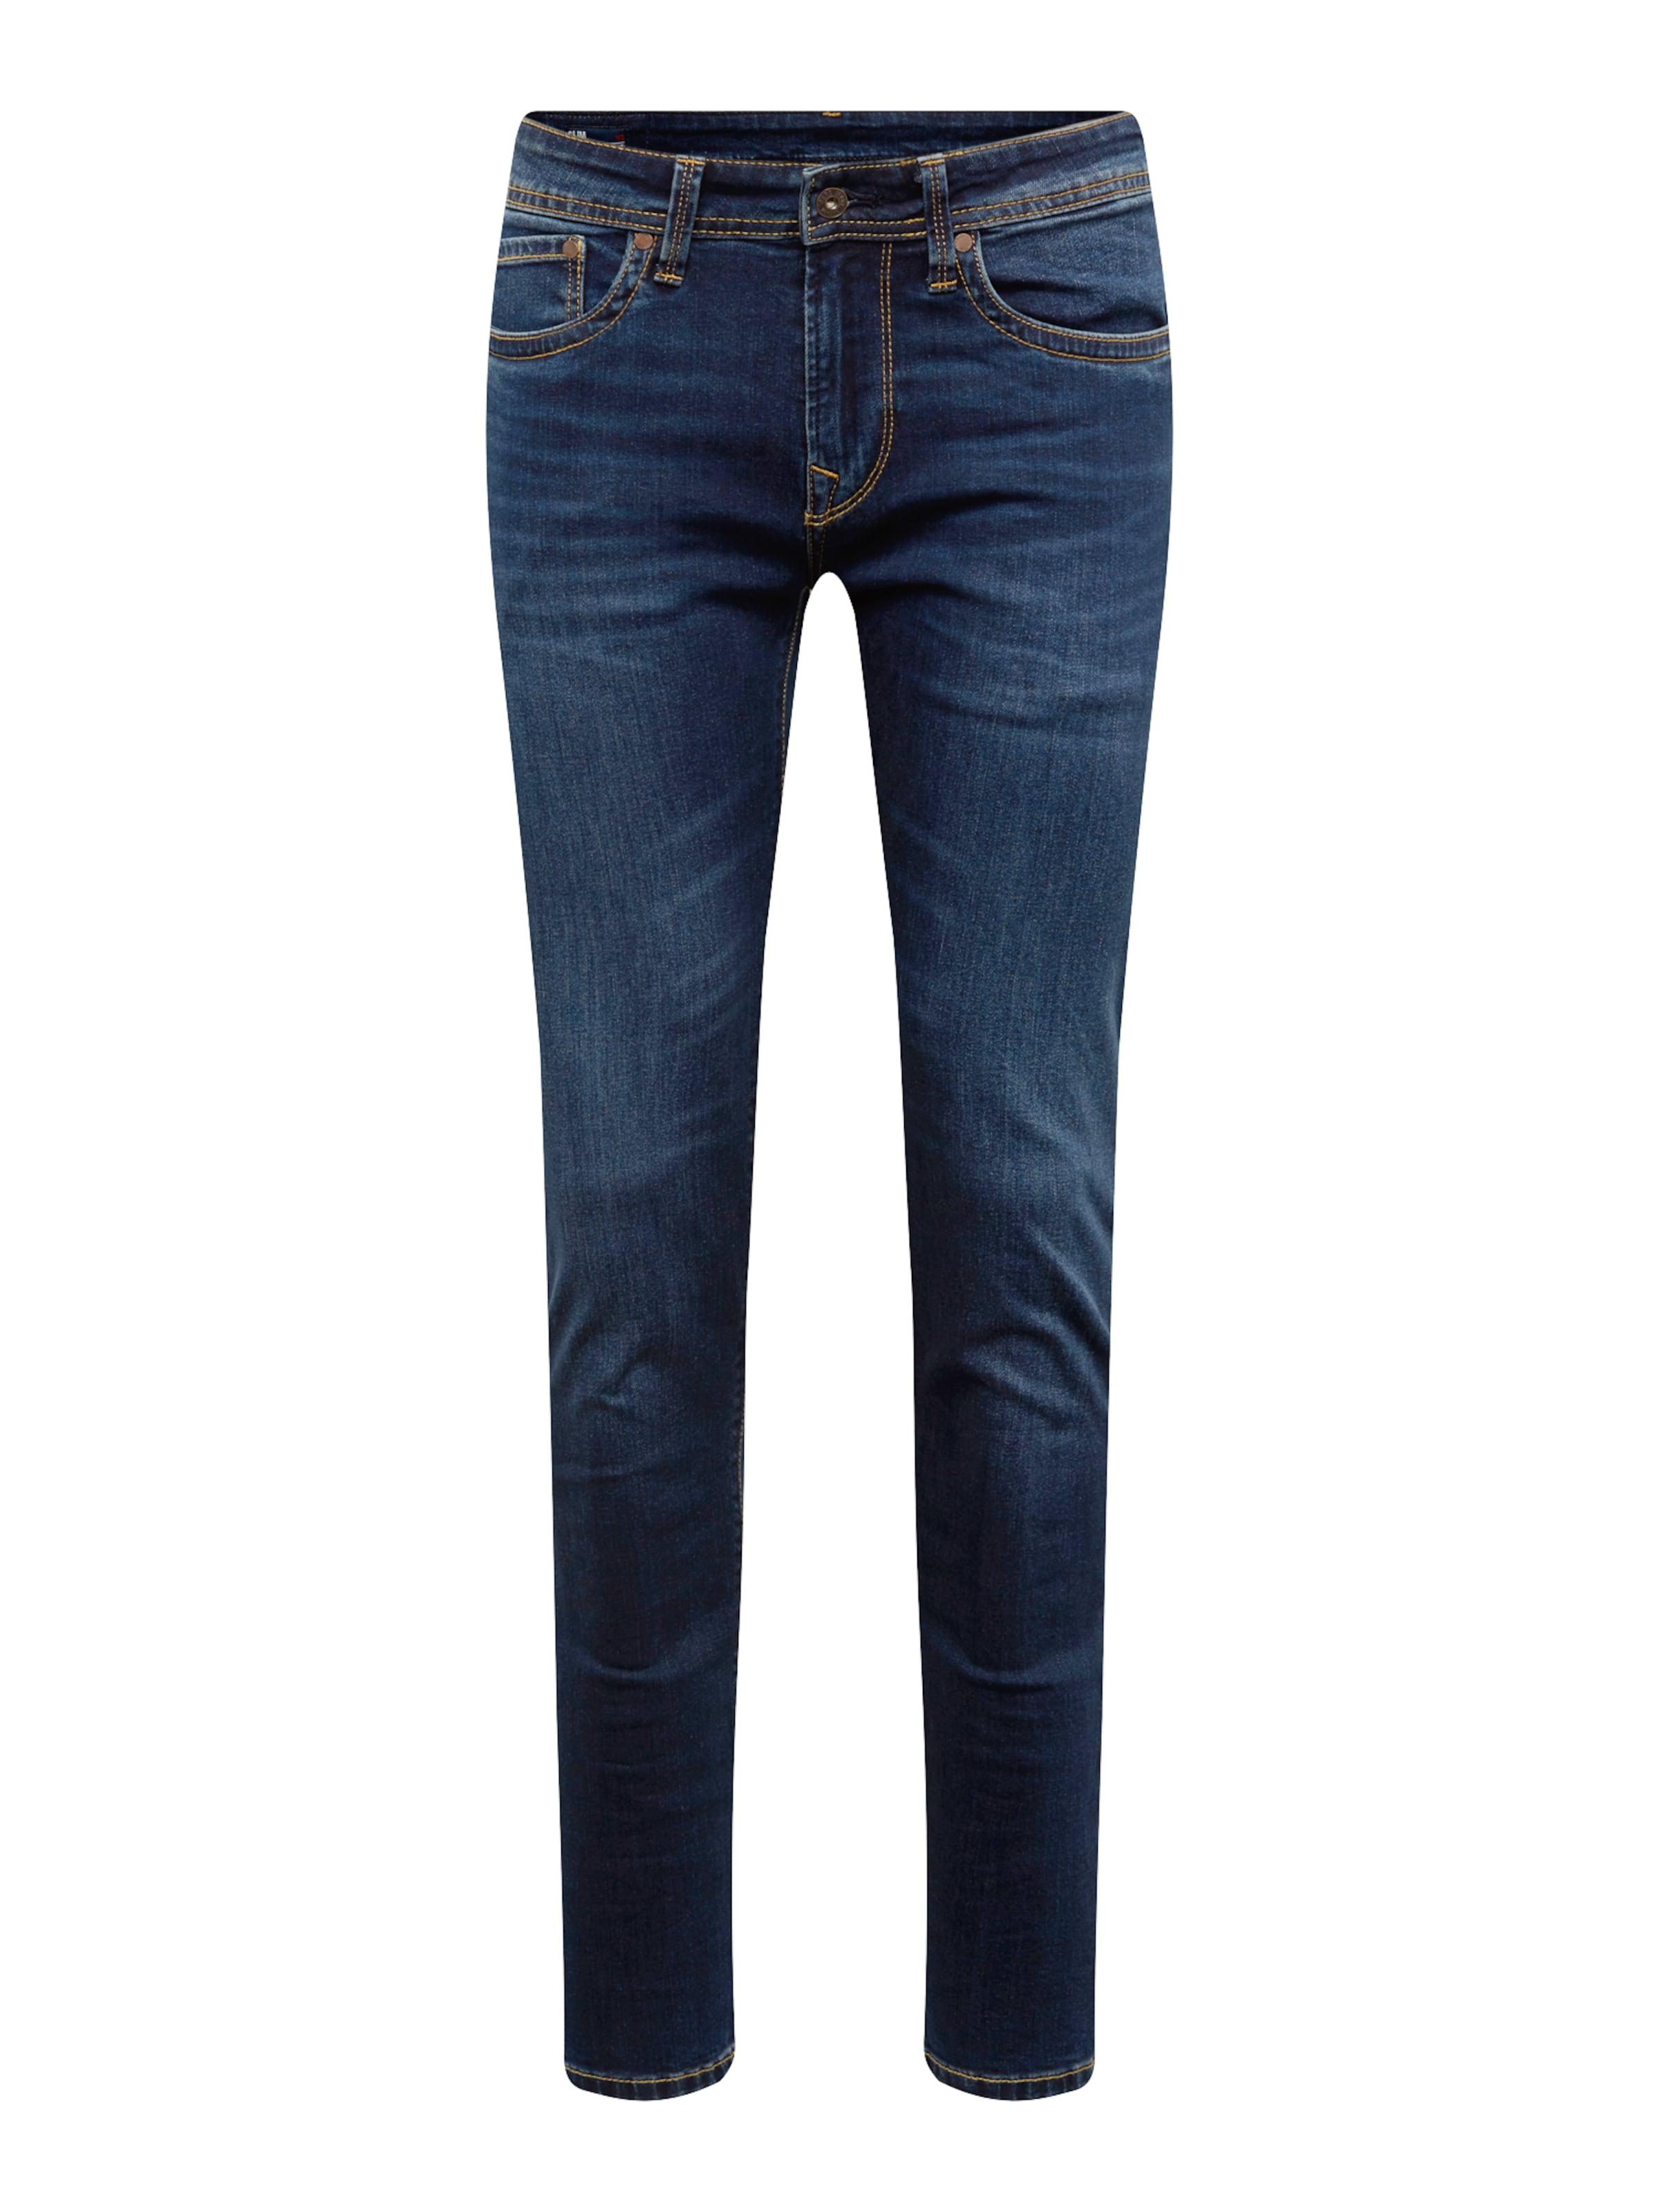 Jean Pepe 'hatch' En Bleu Denim Jeans R3AjL54